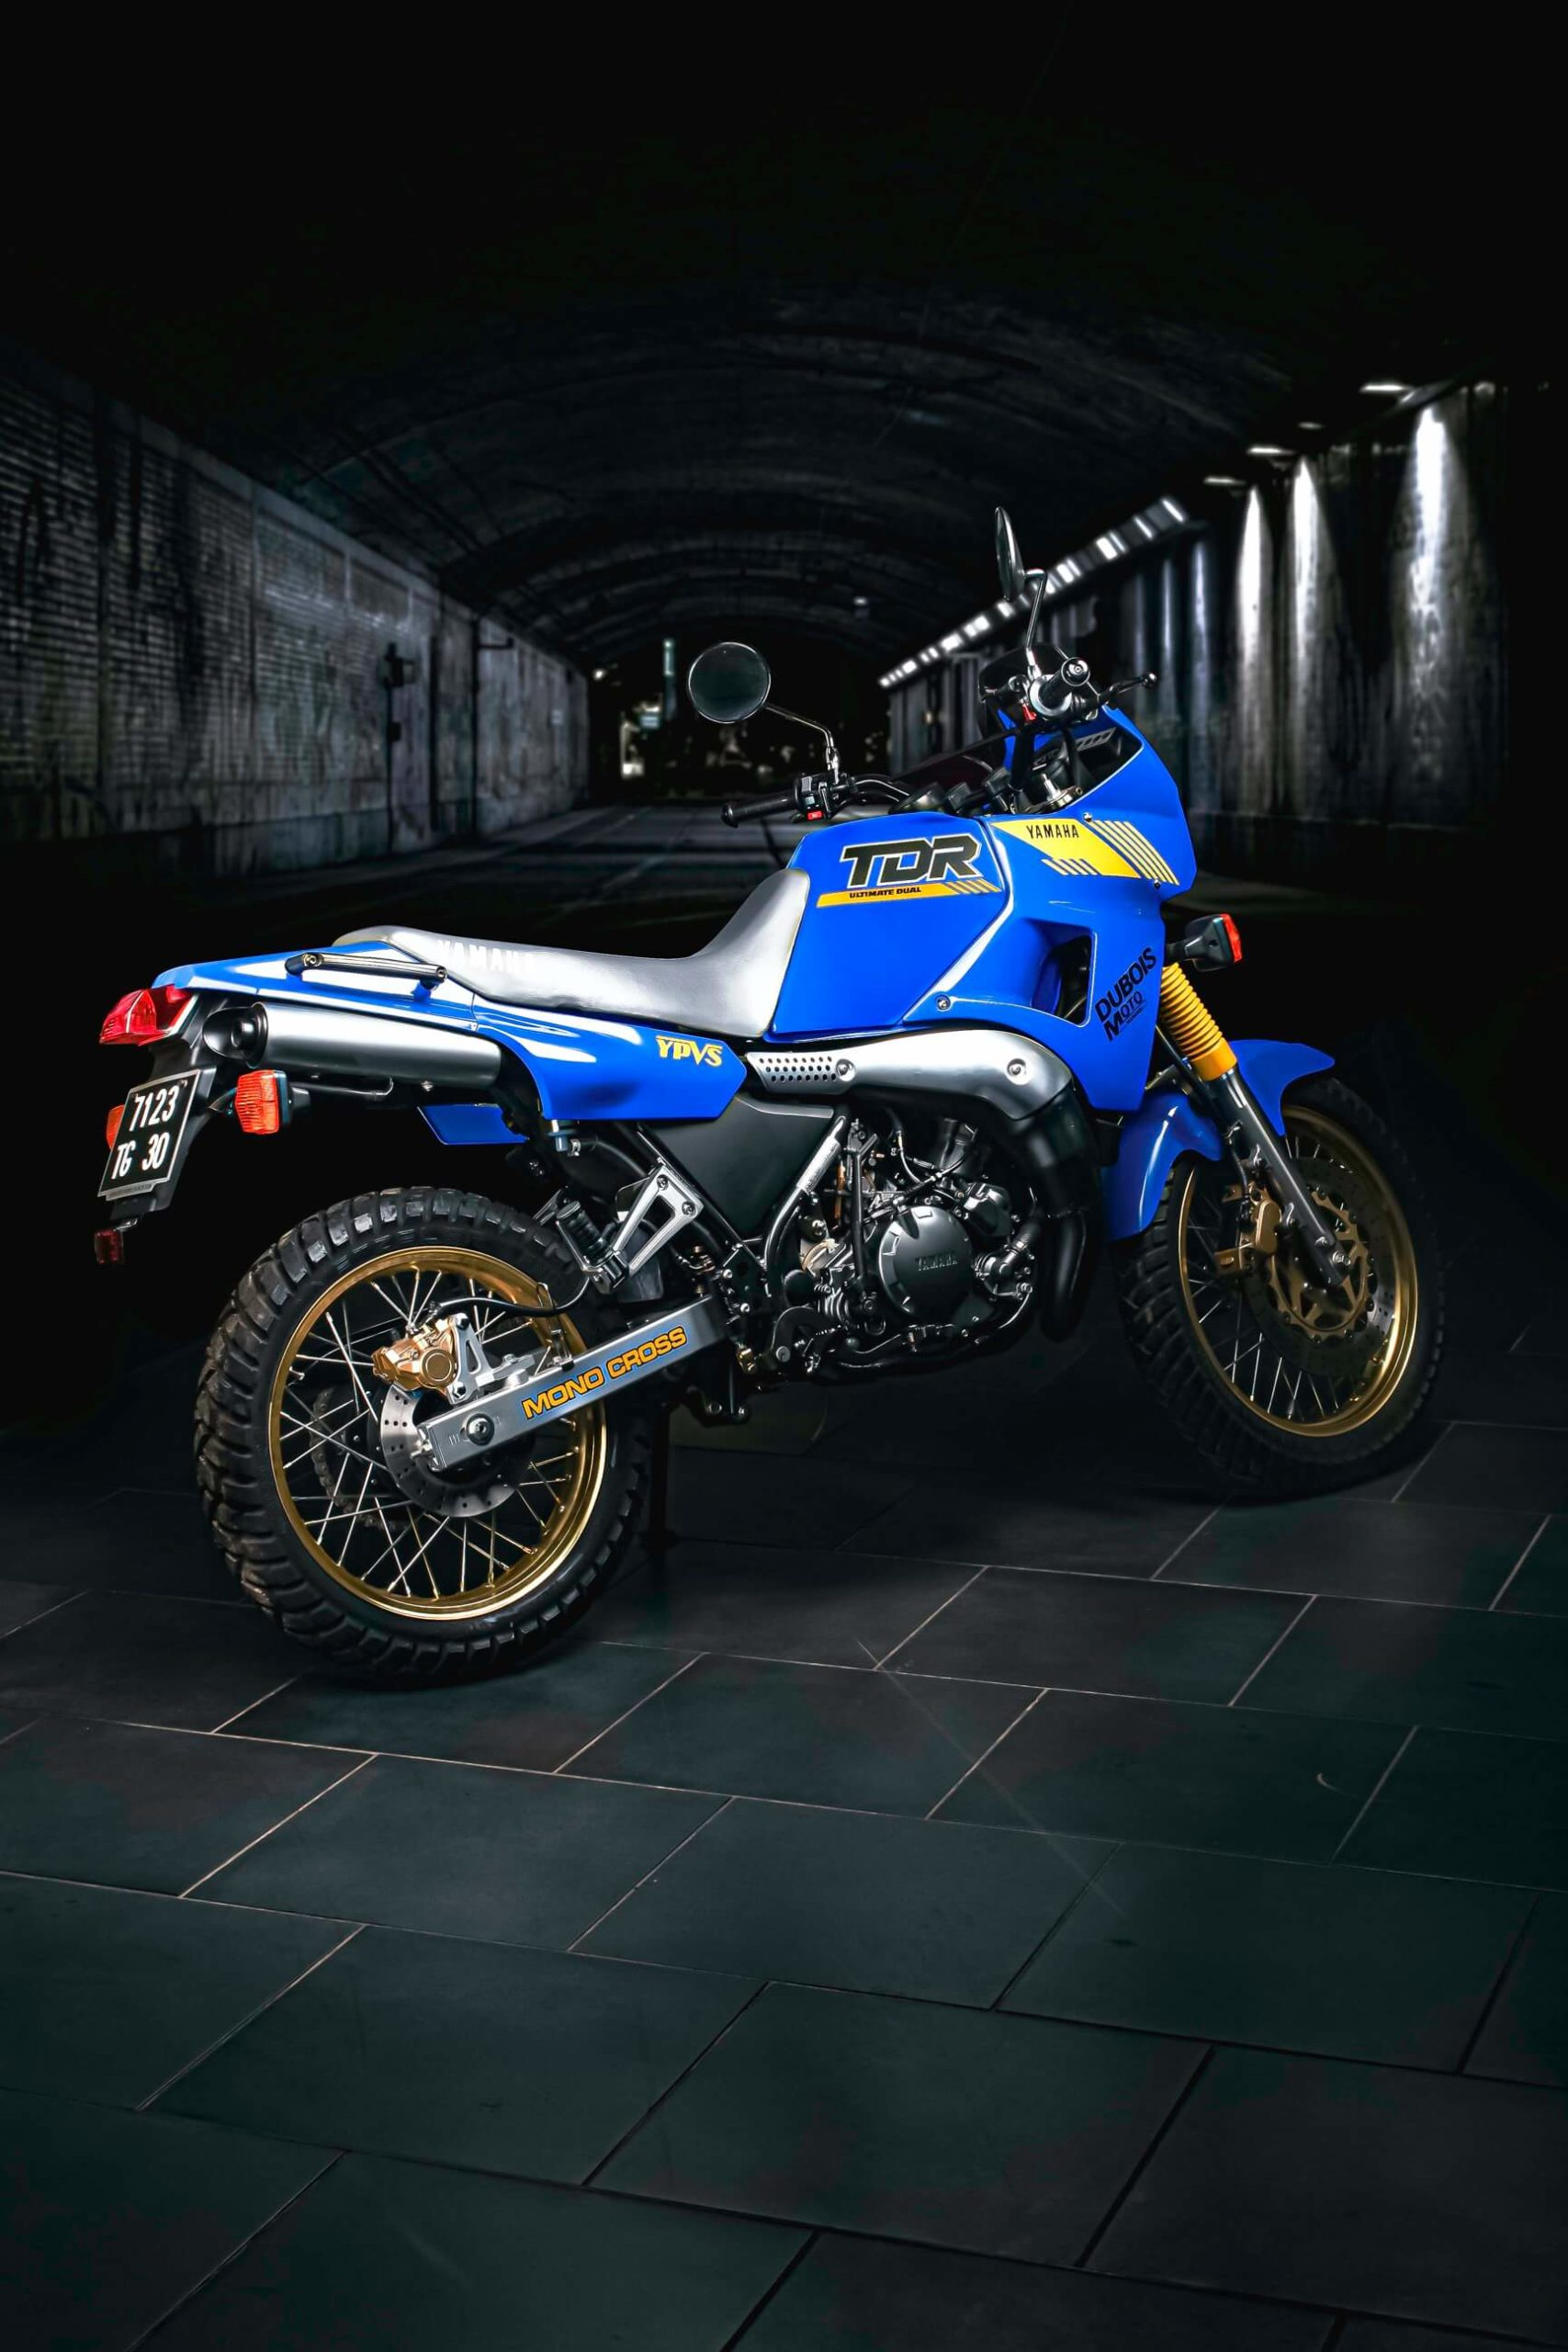 Yamaha 240 TDR 240TDR